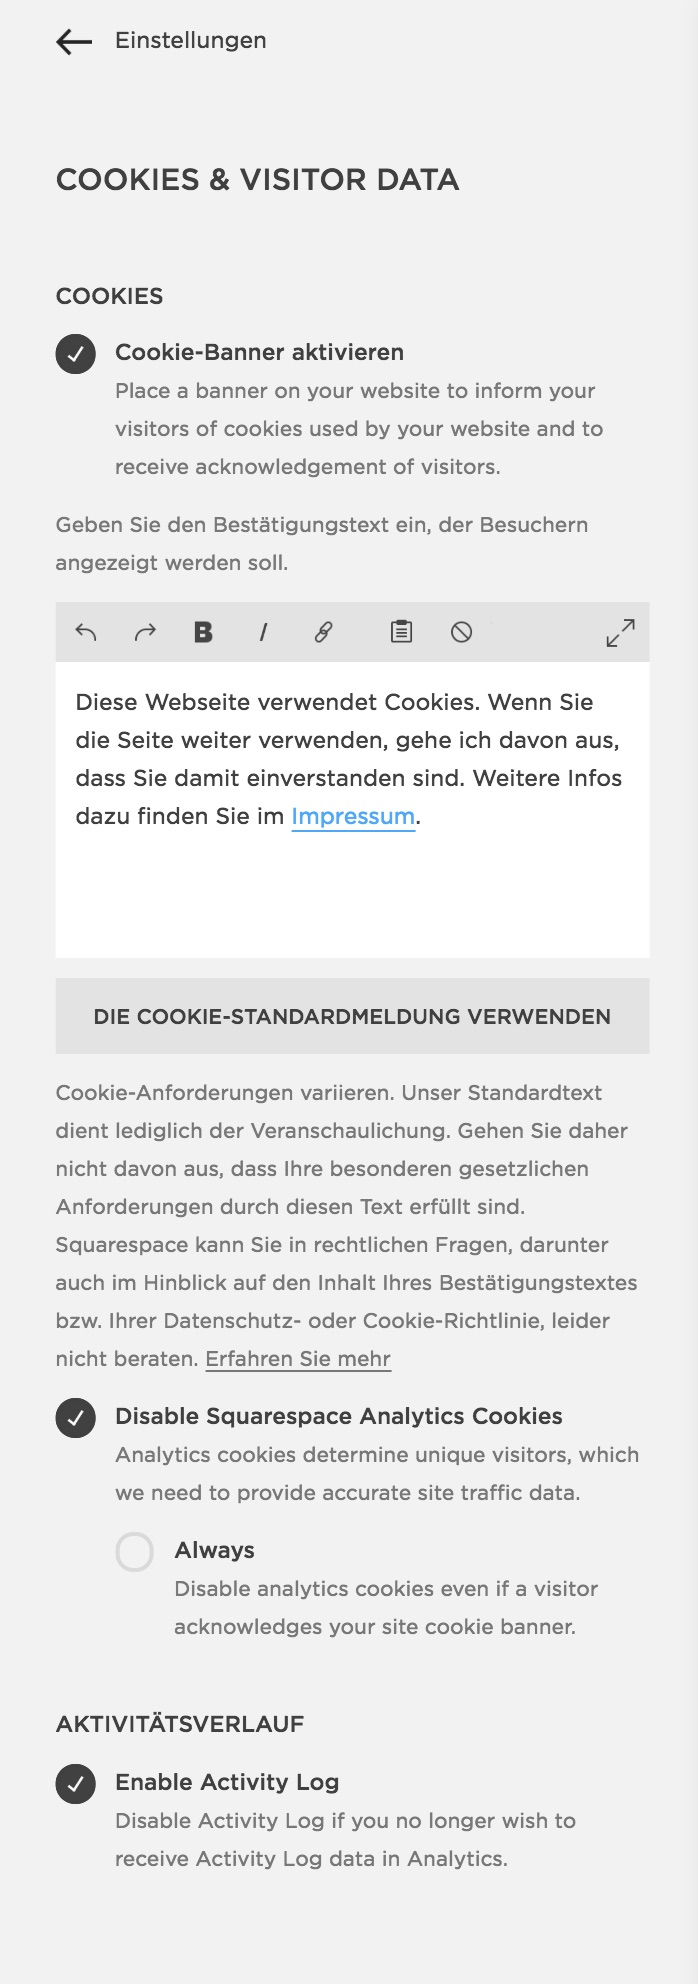 Cookie-Banner_aktivieren_—_Sandra_Oberer_Fotografie.jpg